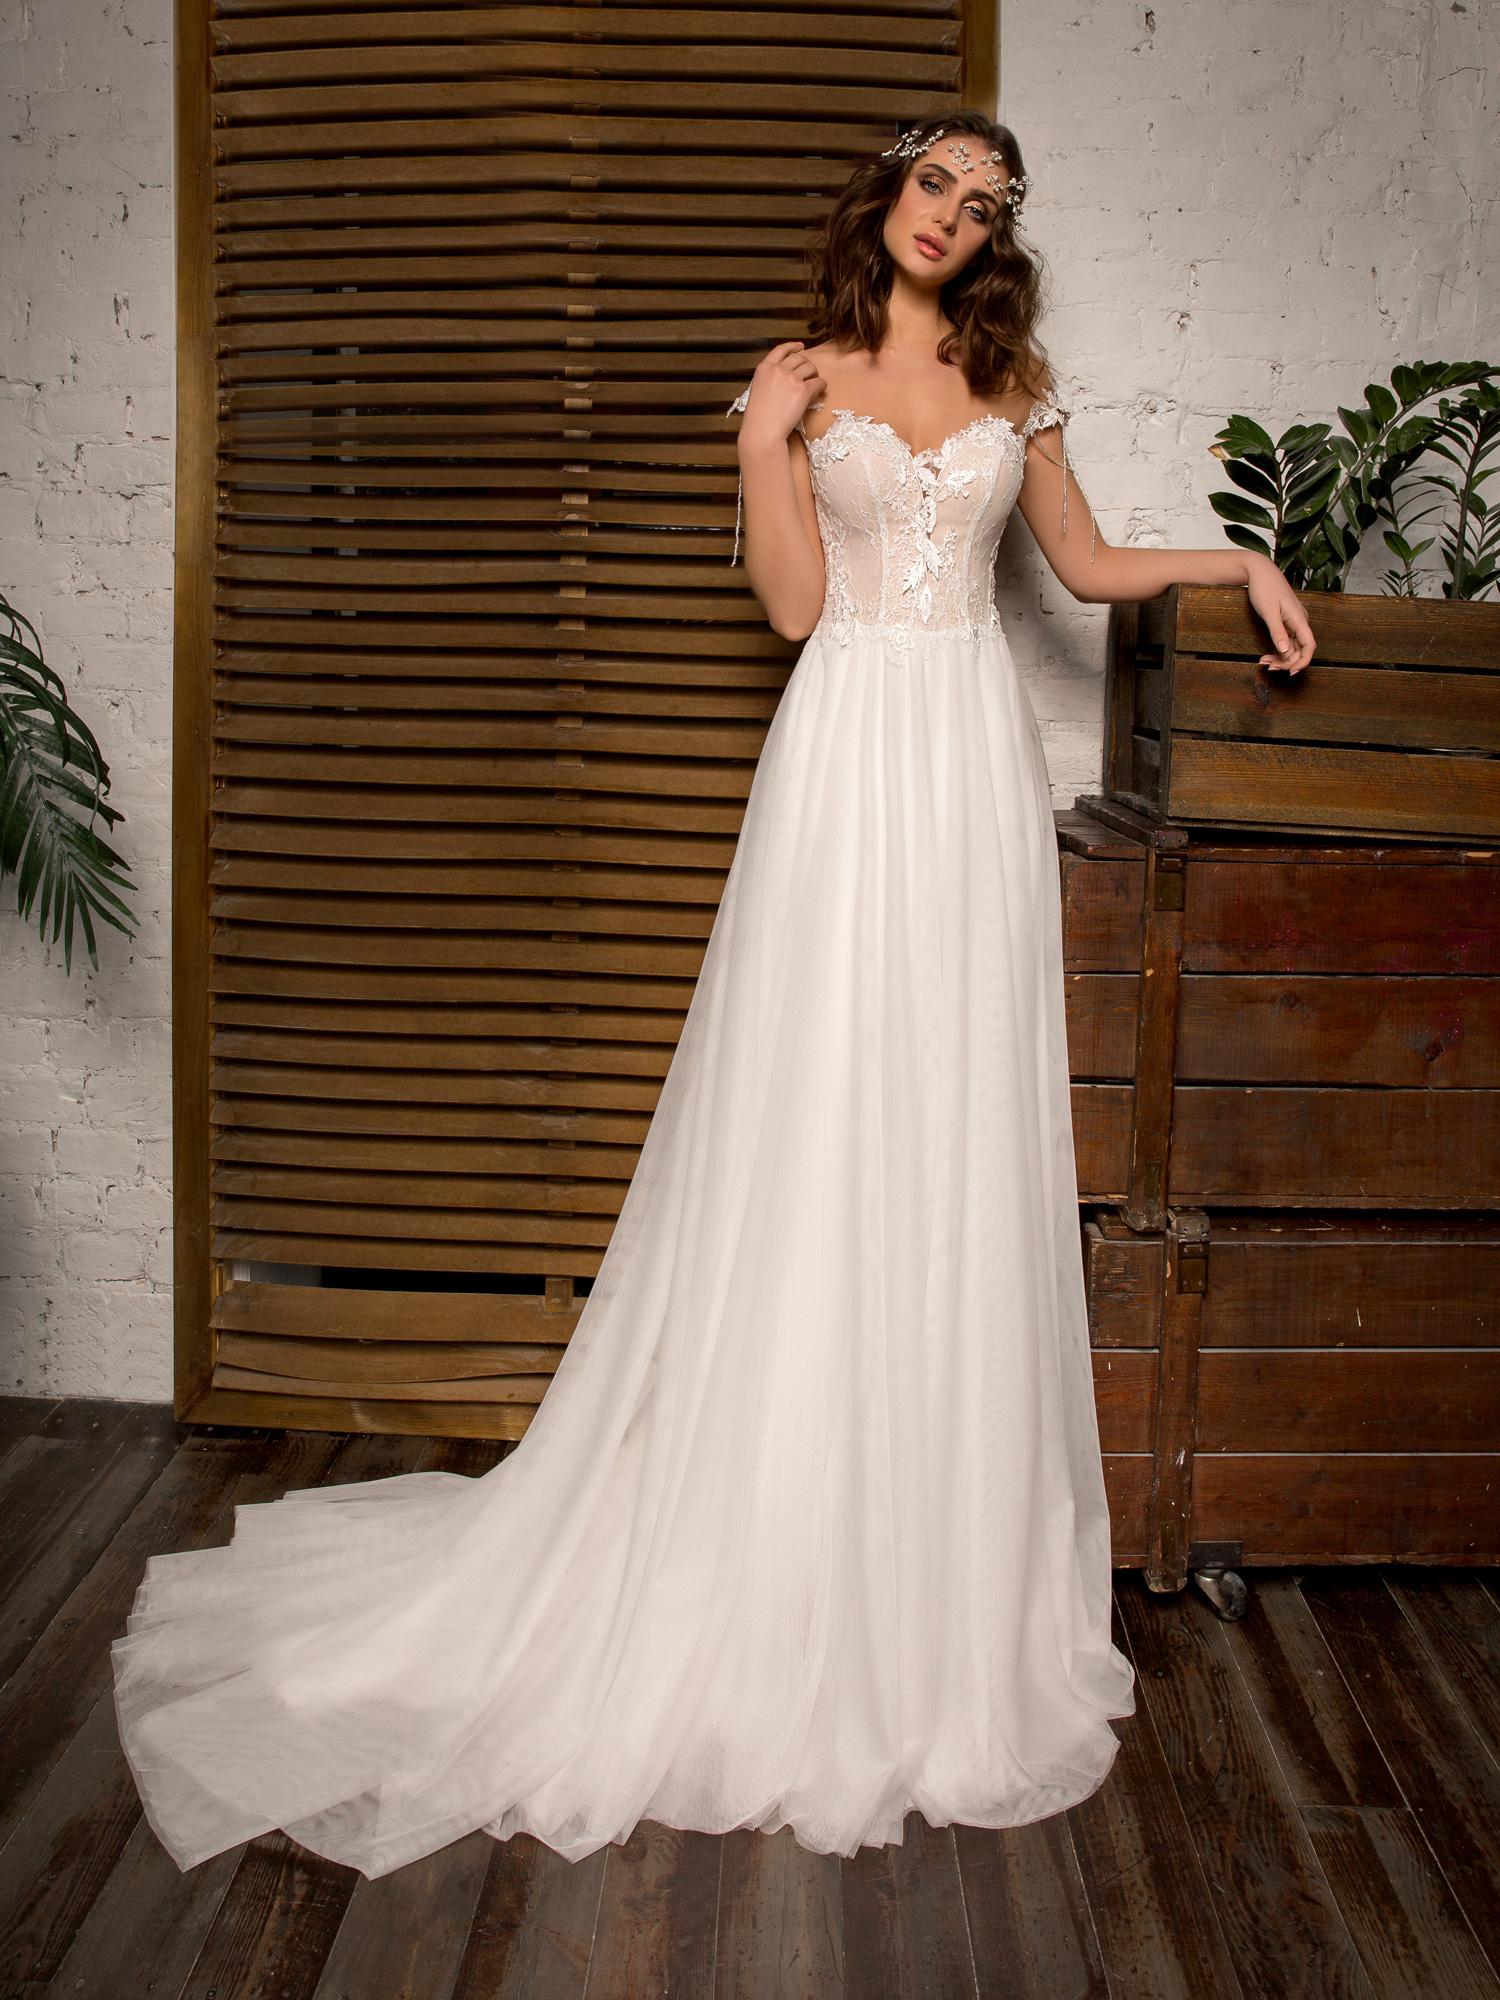 robe de mari e nice par herv paris chez white boutik. Black Bedroom Furniture Sets. Home Design Ideas